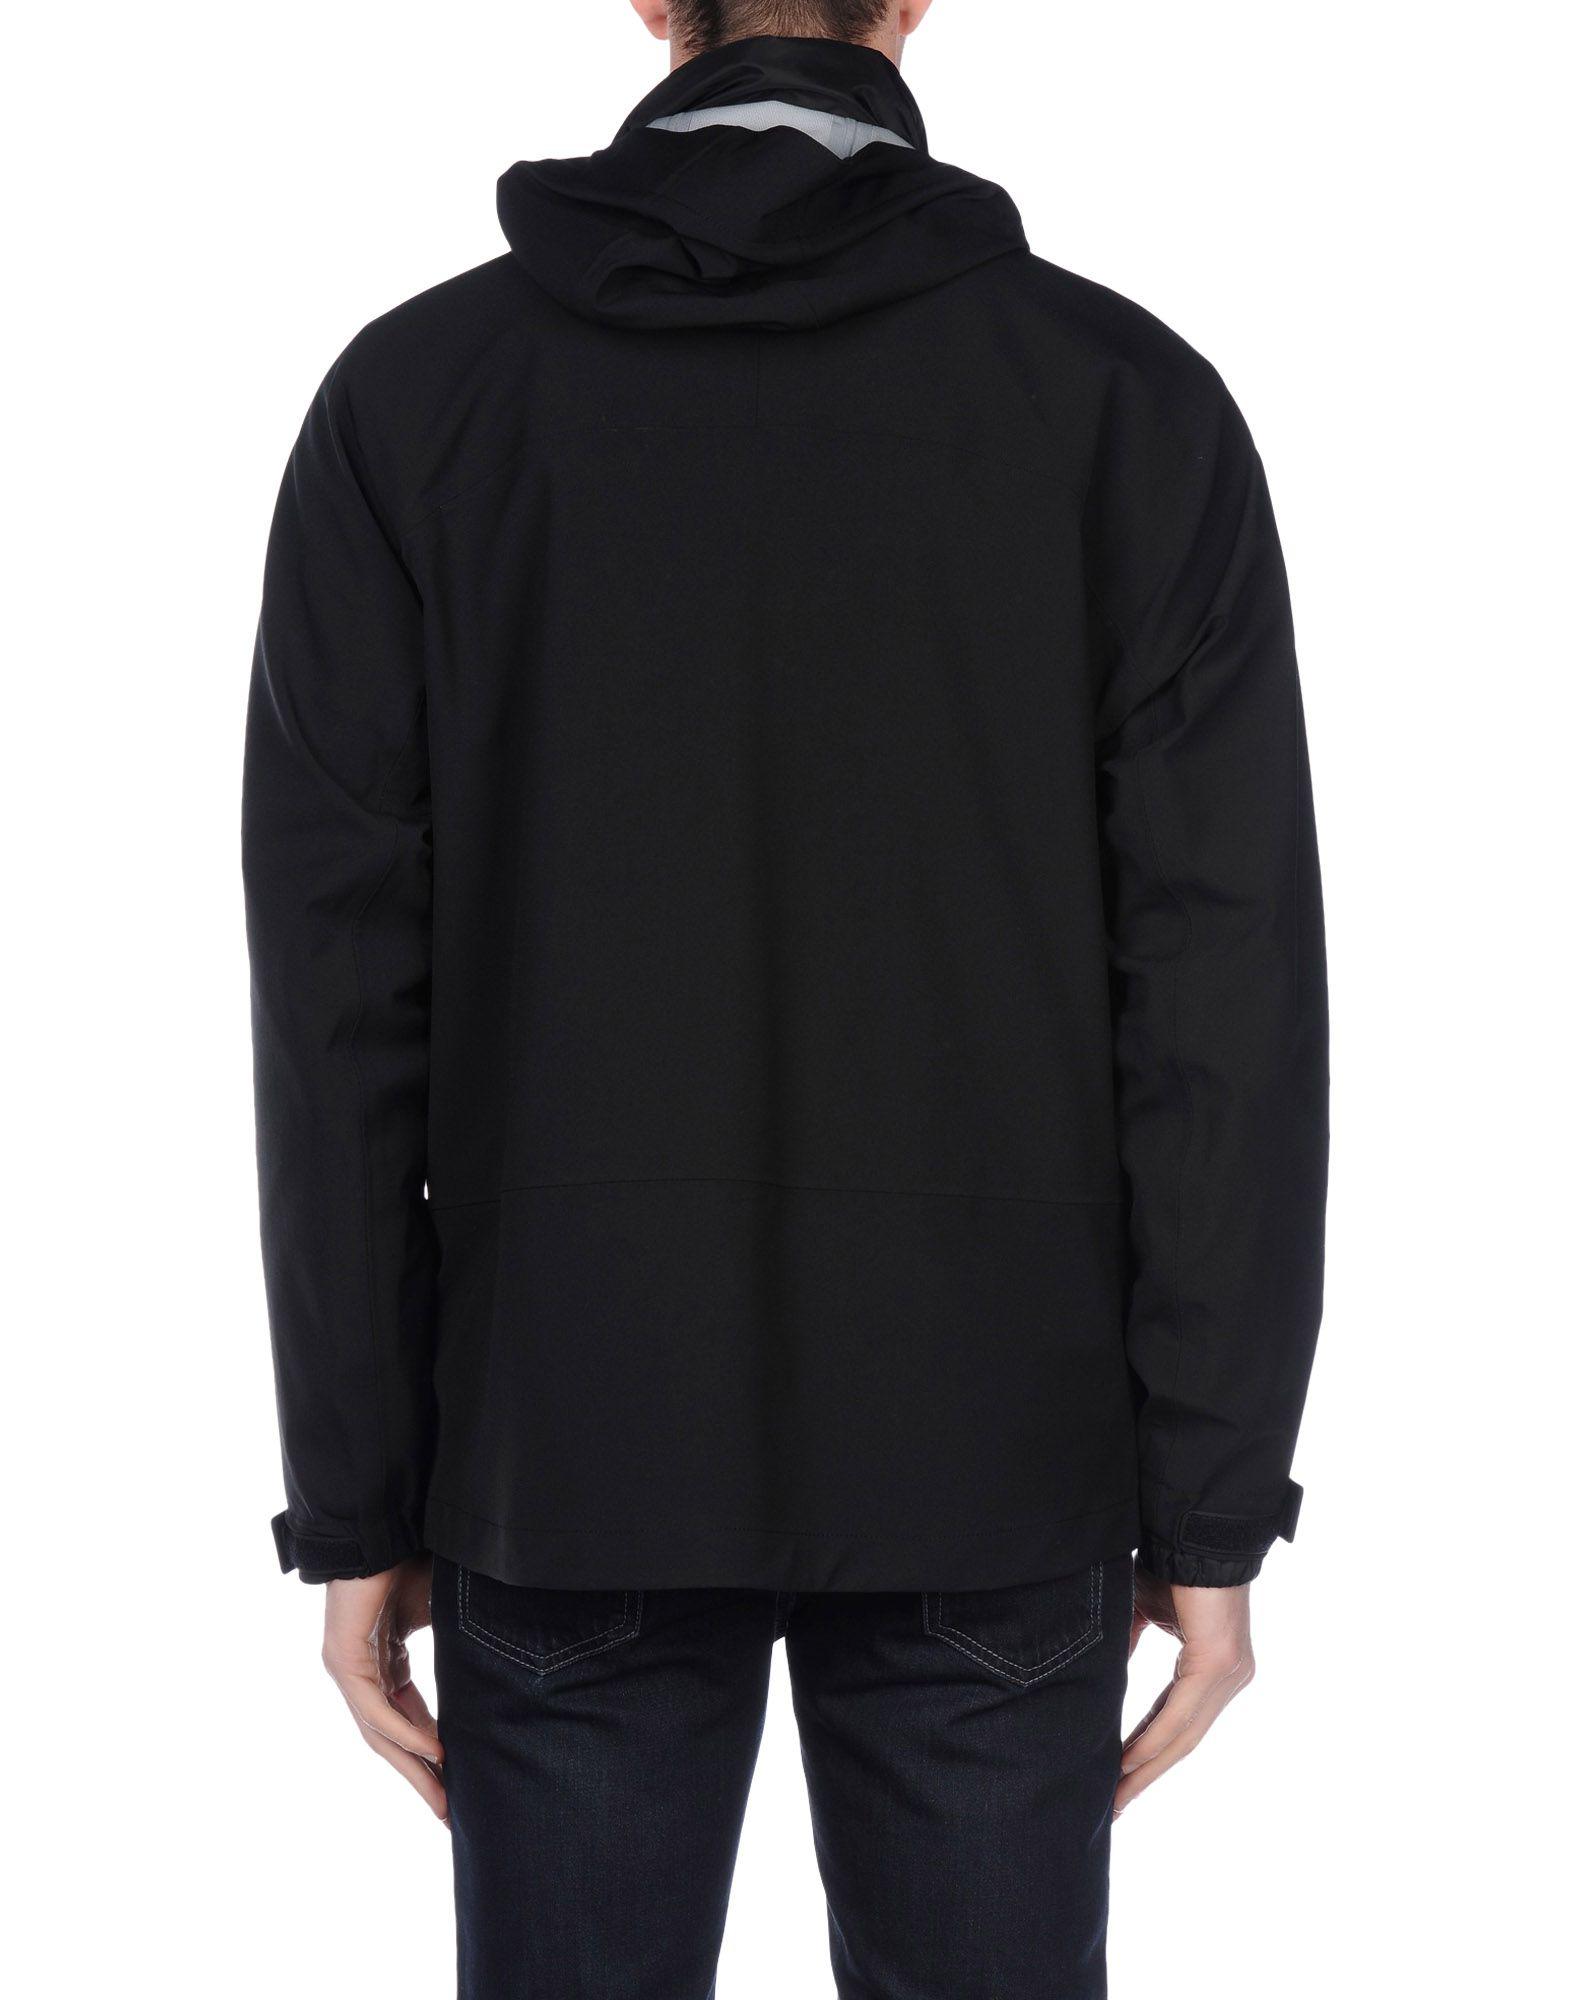 Prada Sport Jacket In Black For Men Lyst